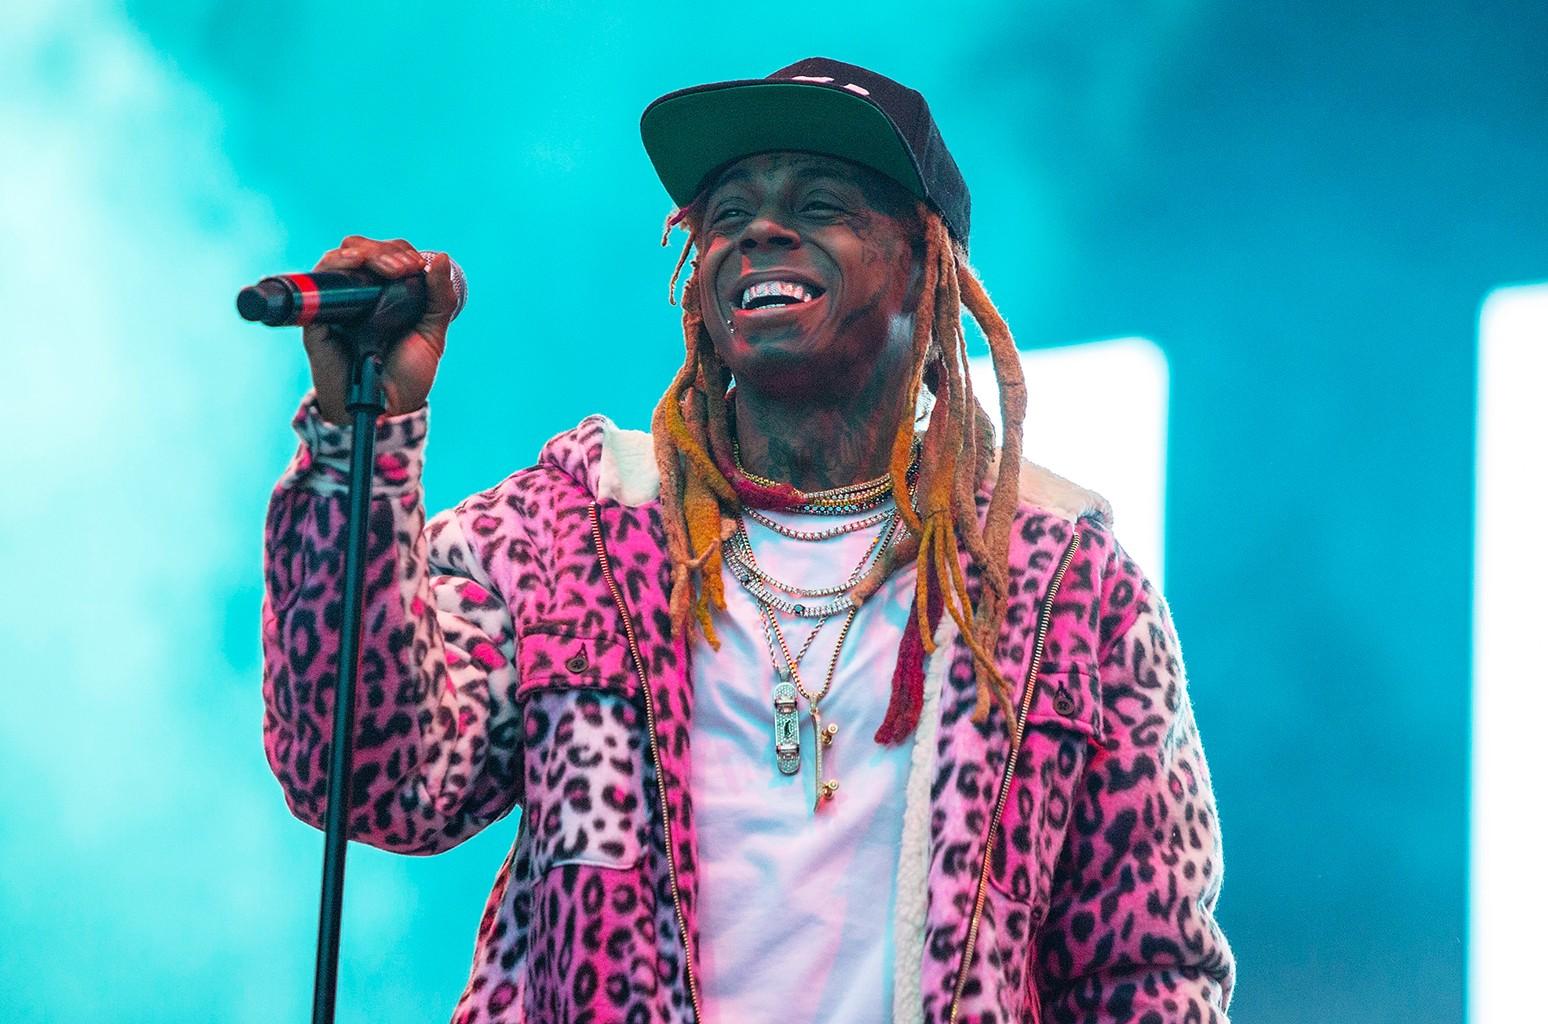 21+ Download Lil Wayne How To Love Instrumental JPG